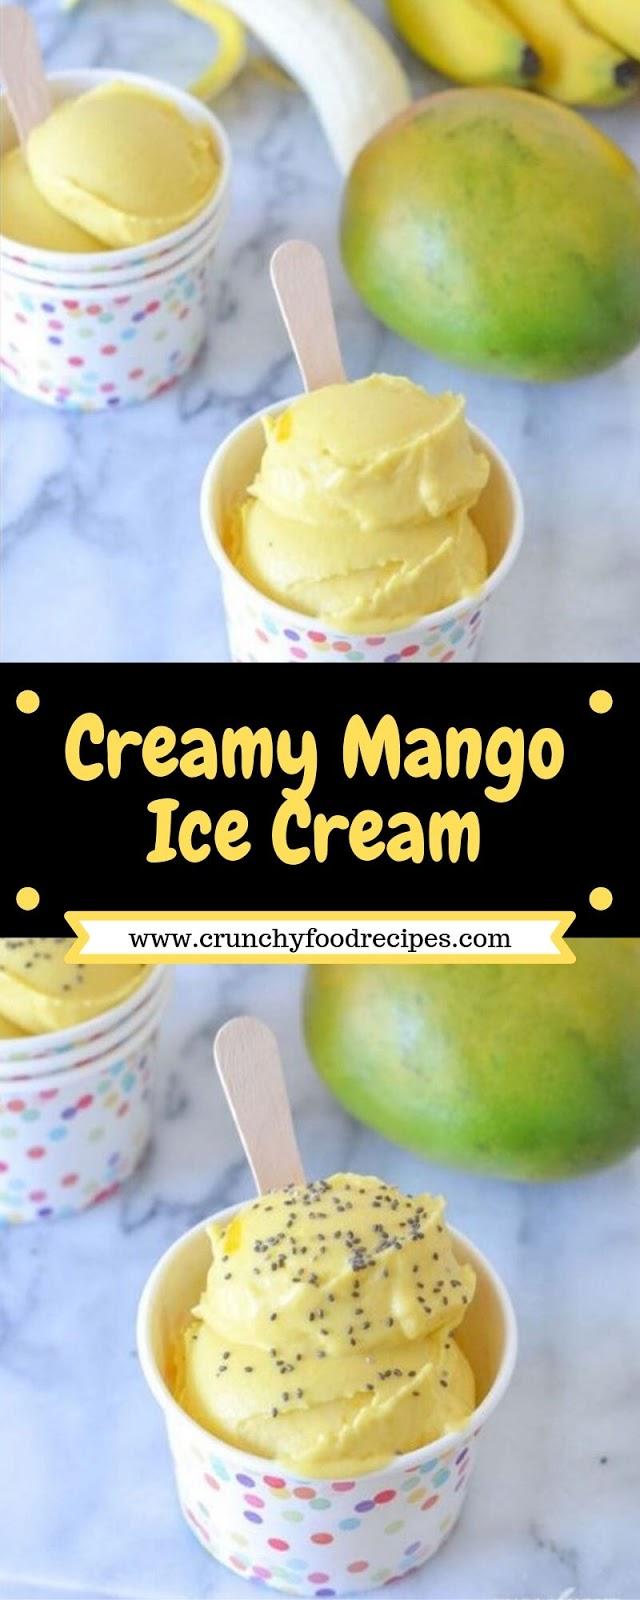 Creamy Mango Ice Cream